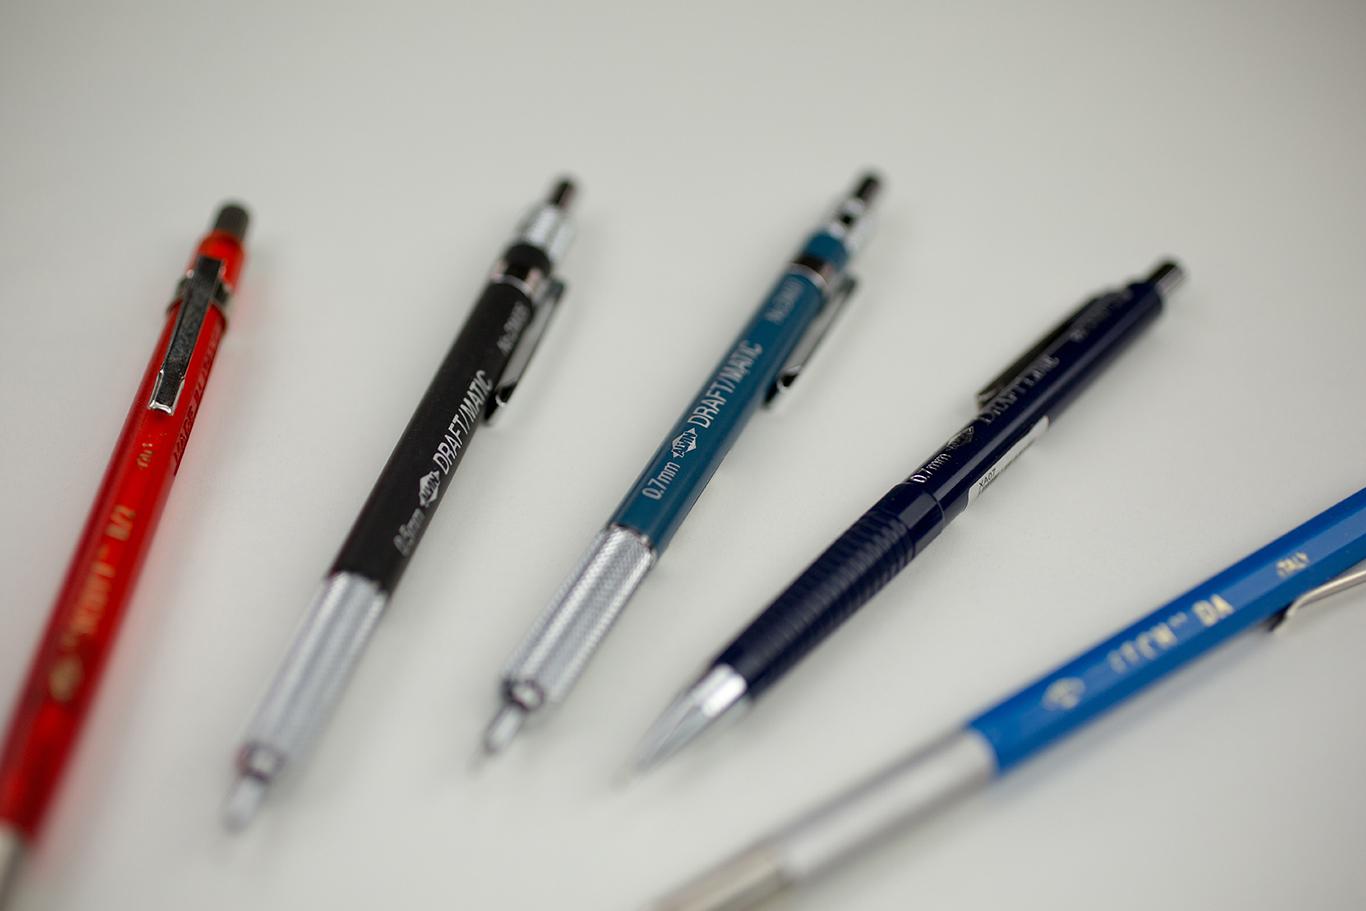 Alvin® Draft-Matic Mechanical Pencils & Lead Holders